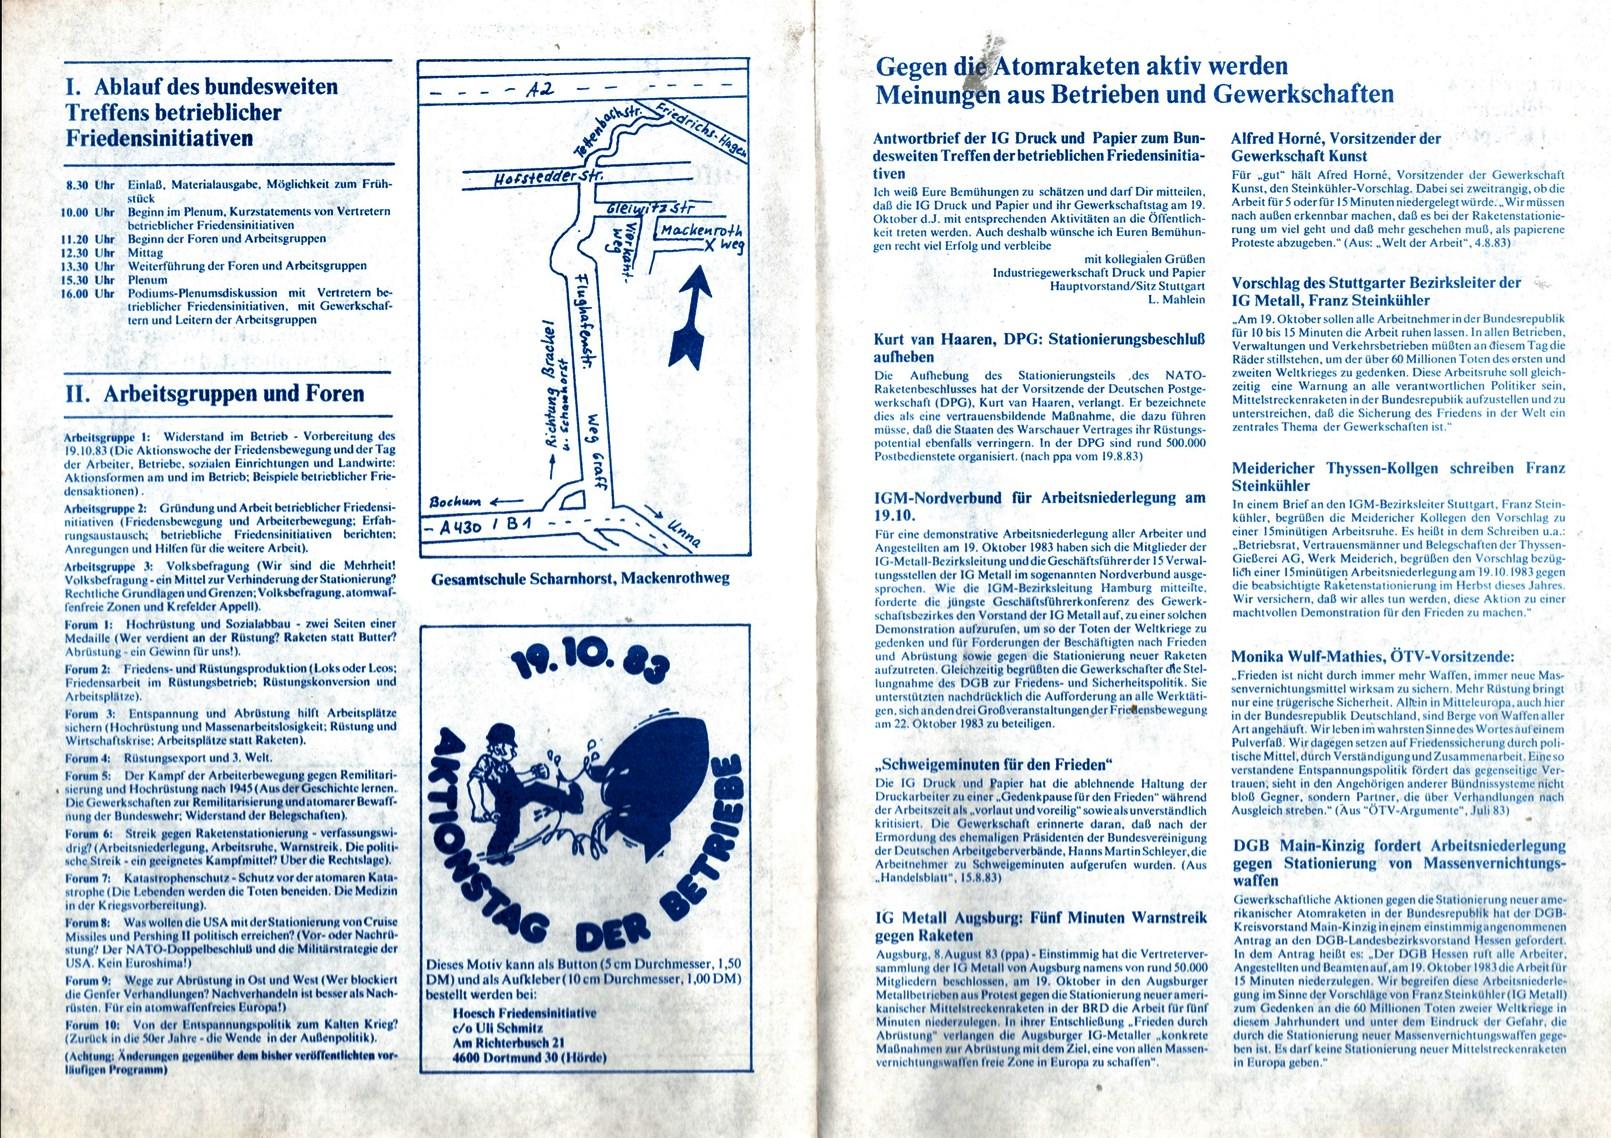 Dortmund_Friedensbewegung_19830907_002